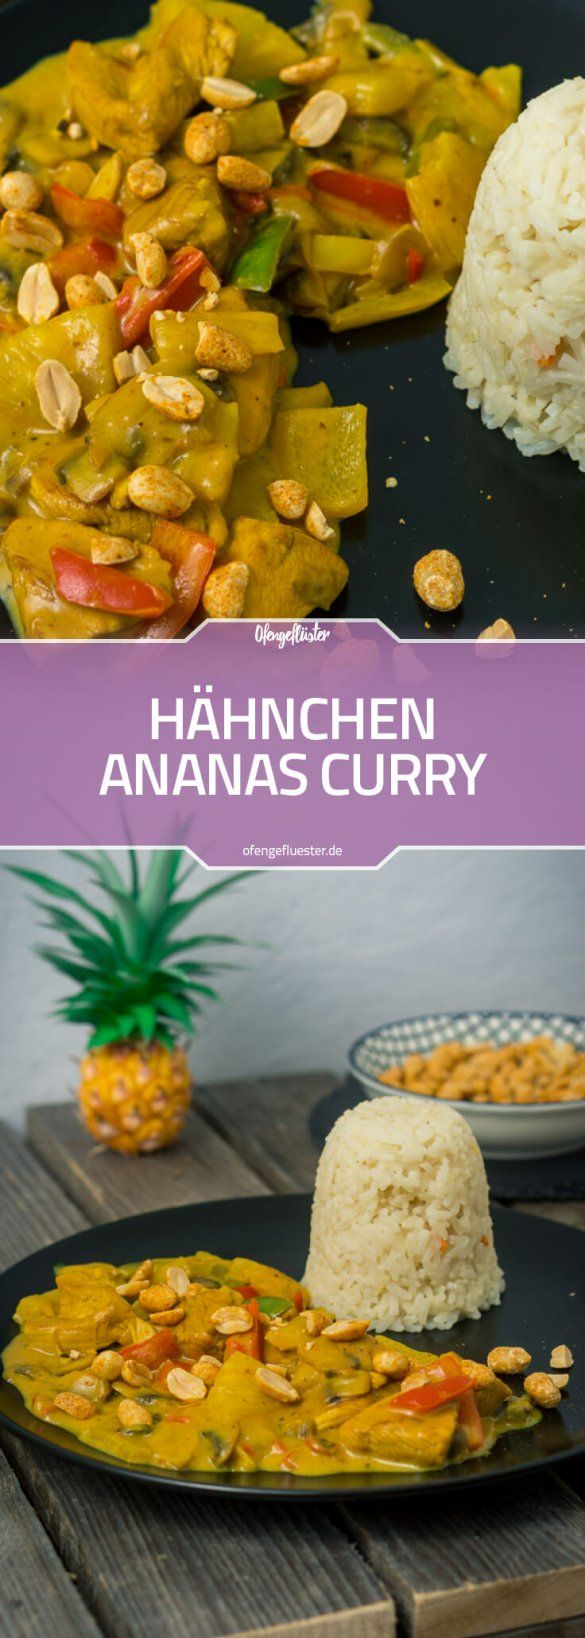 Hähnchen Ananas Curry Rezept › Ofengeflüster